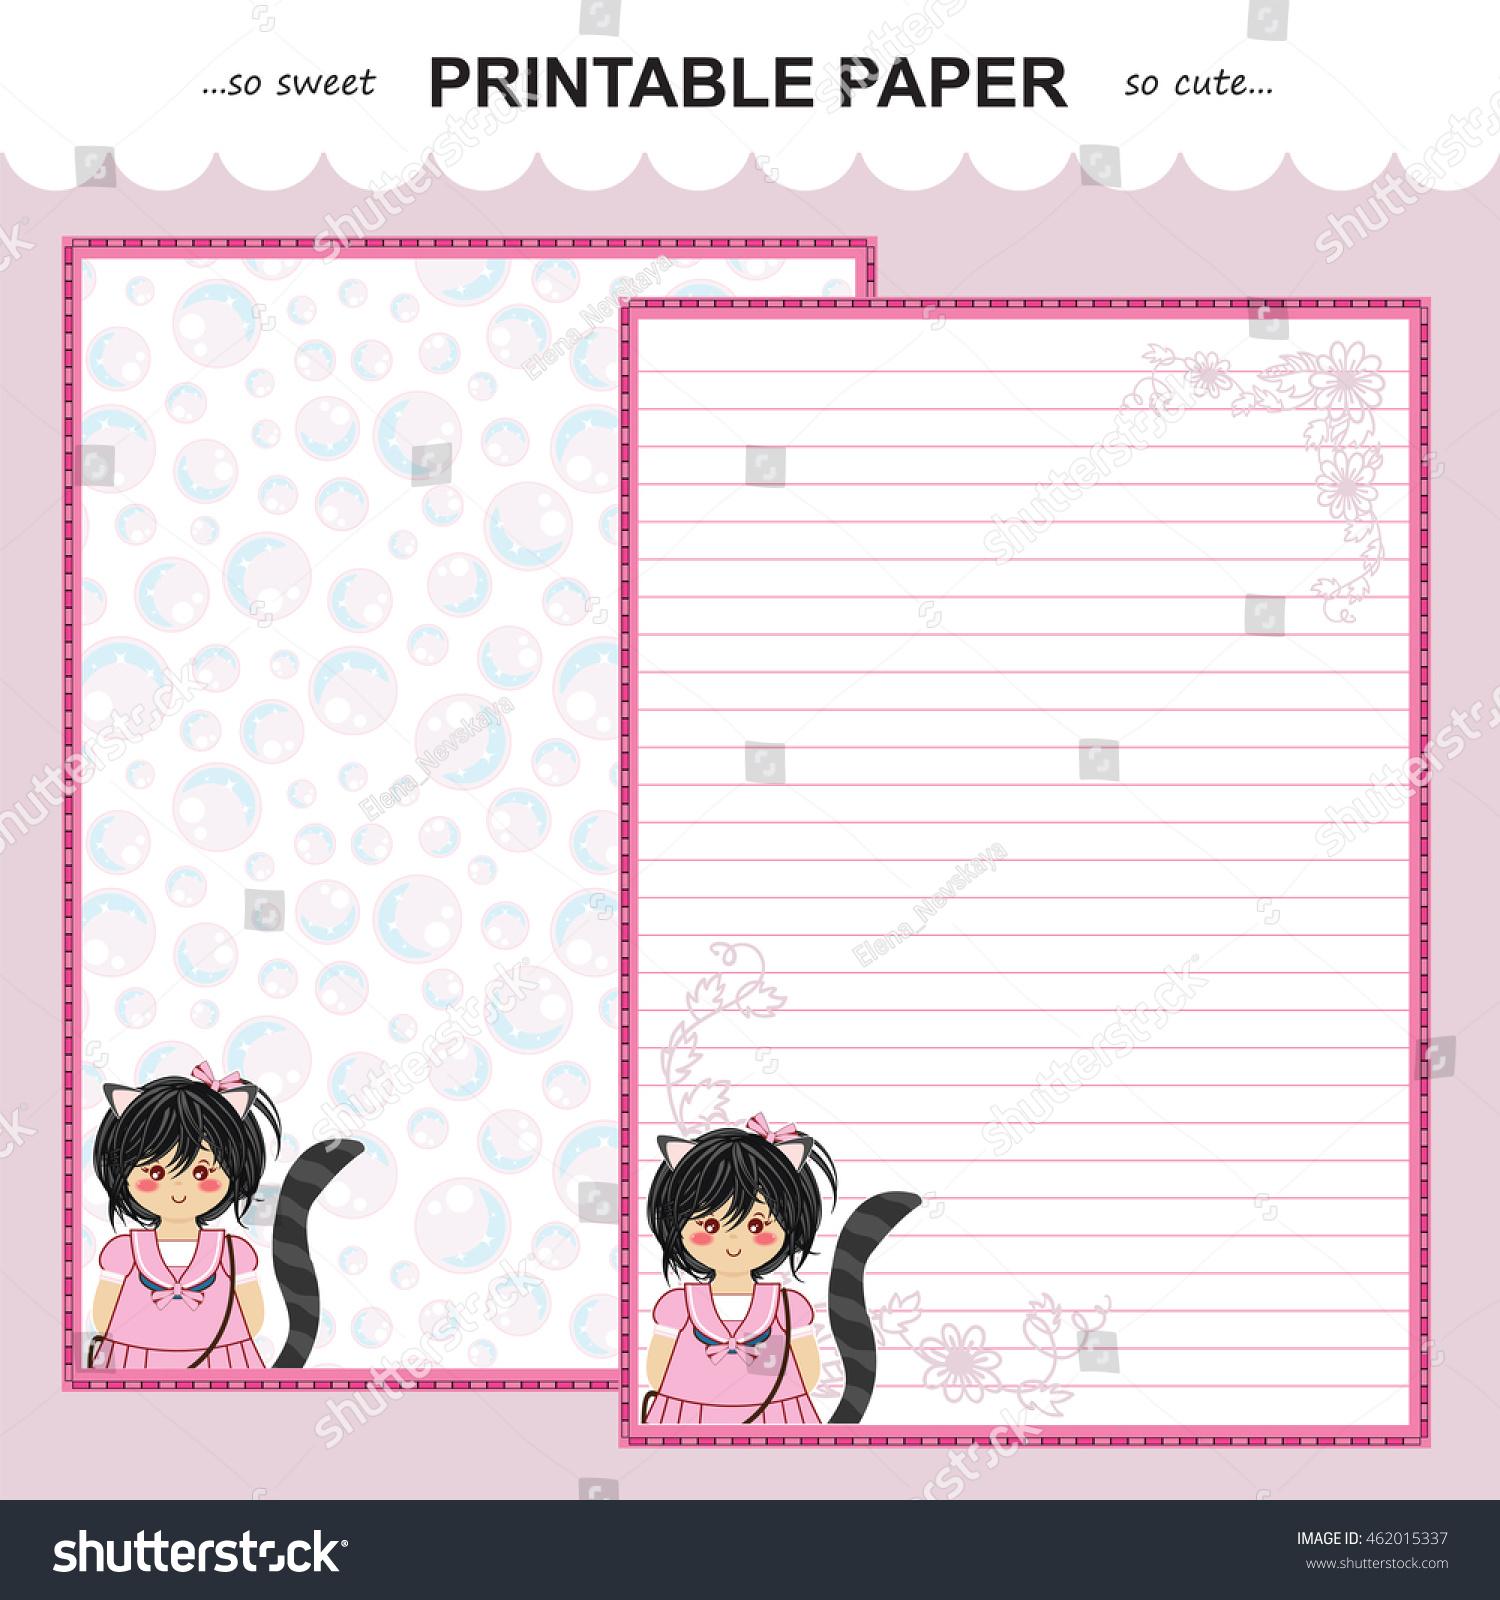 vector printable letter paper stationery flat のベクター画像素材